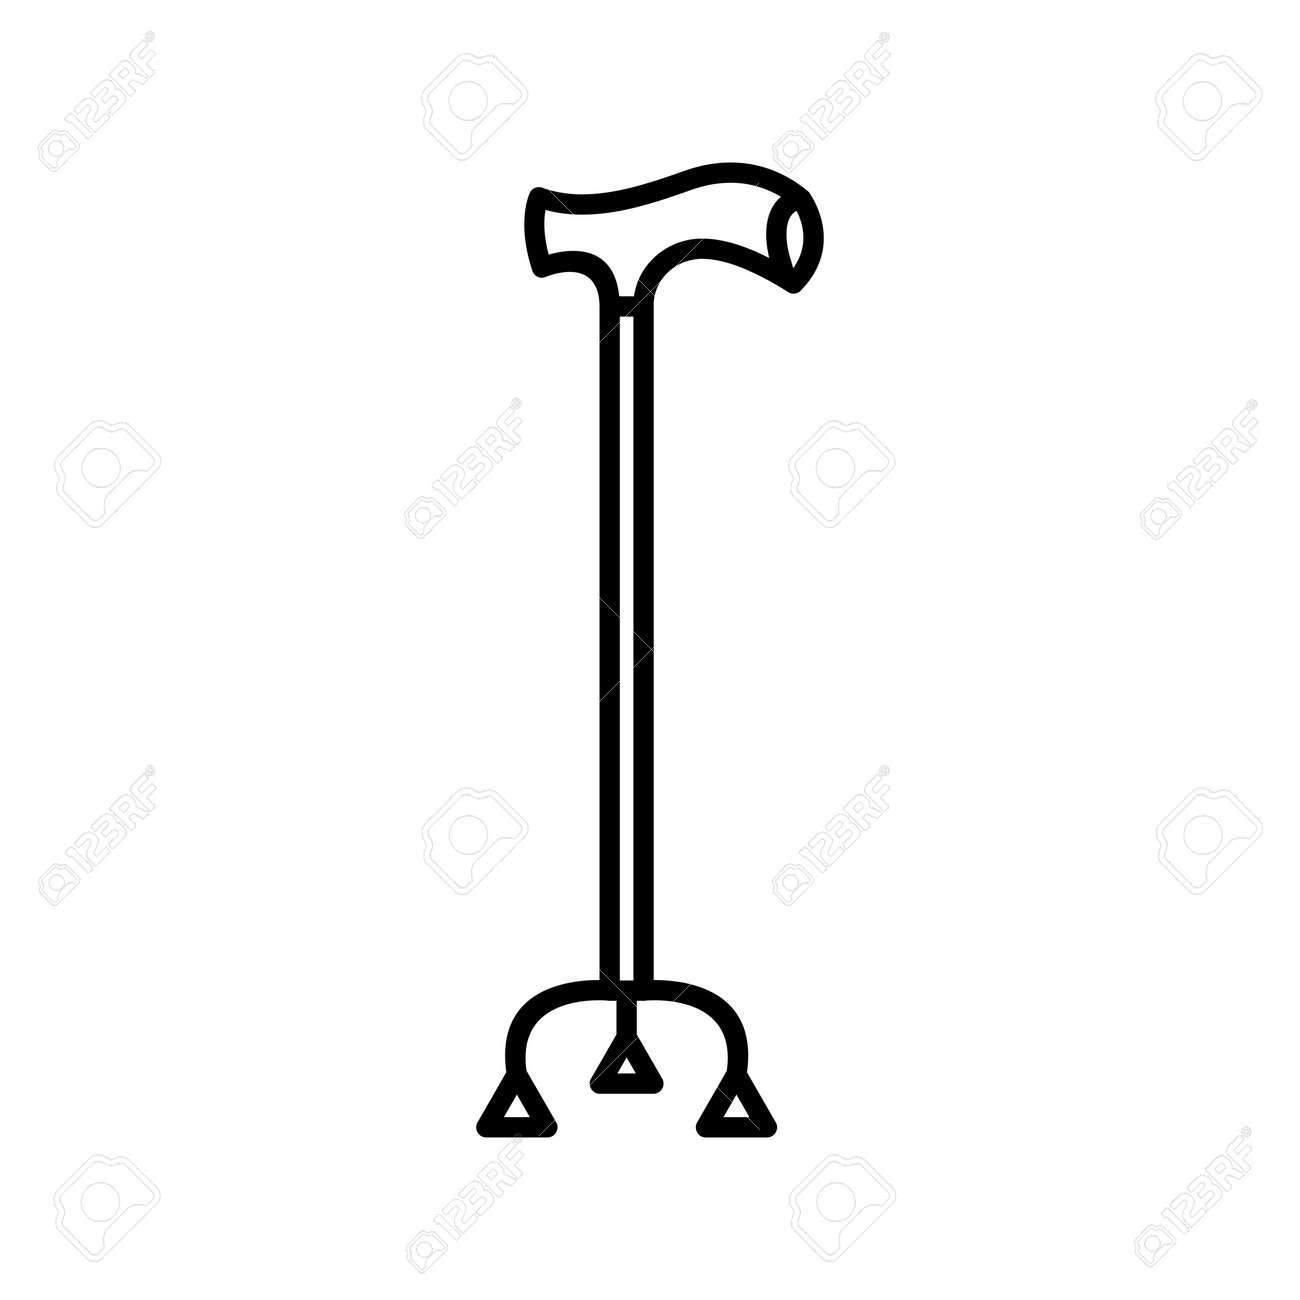 Unique Walking Stick Line Vector Icon - 167962517